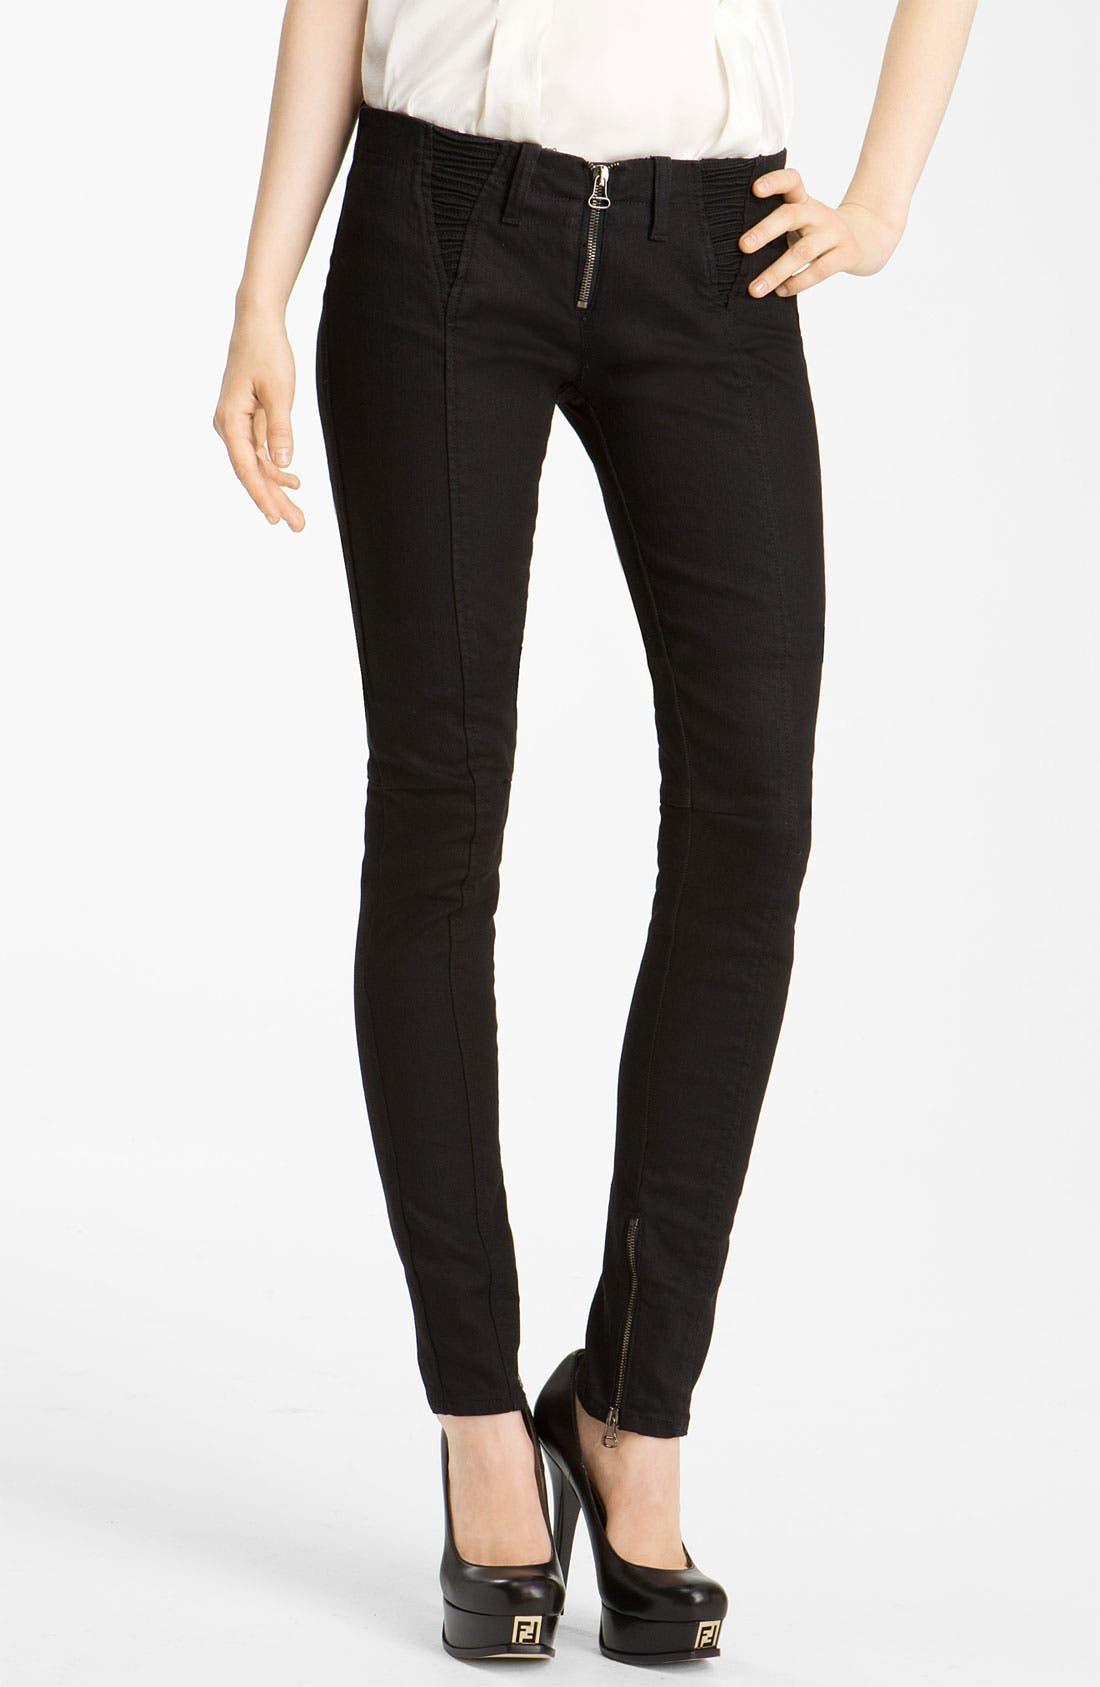 Alternate Image 1 Selected - Pierre Balmain Skinny Stretch Denim Jeans